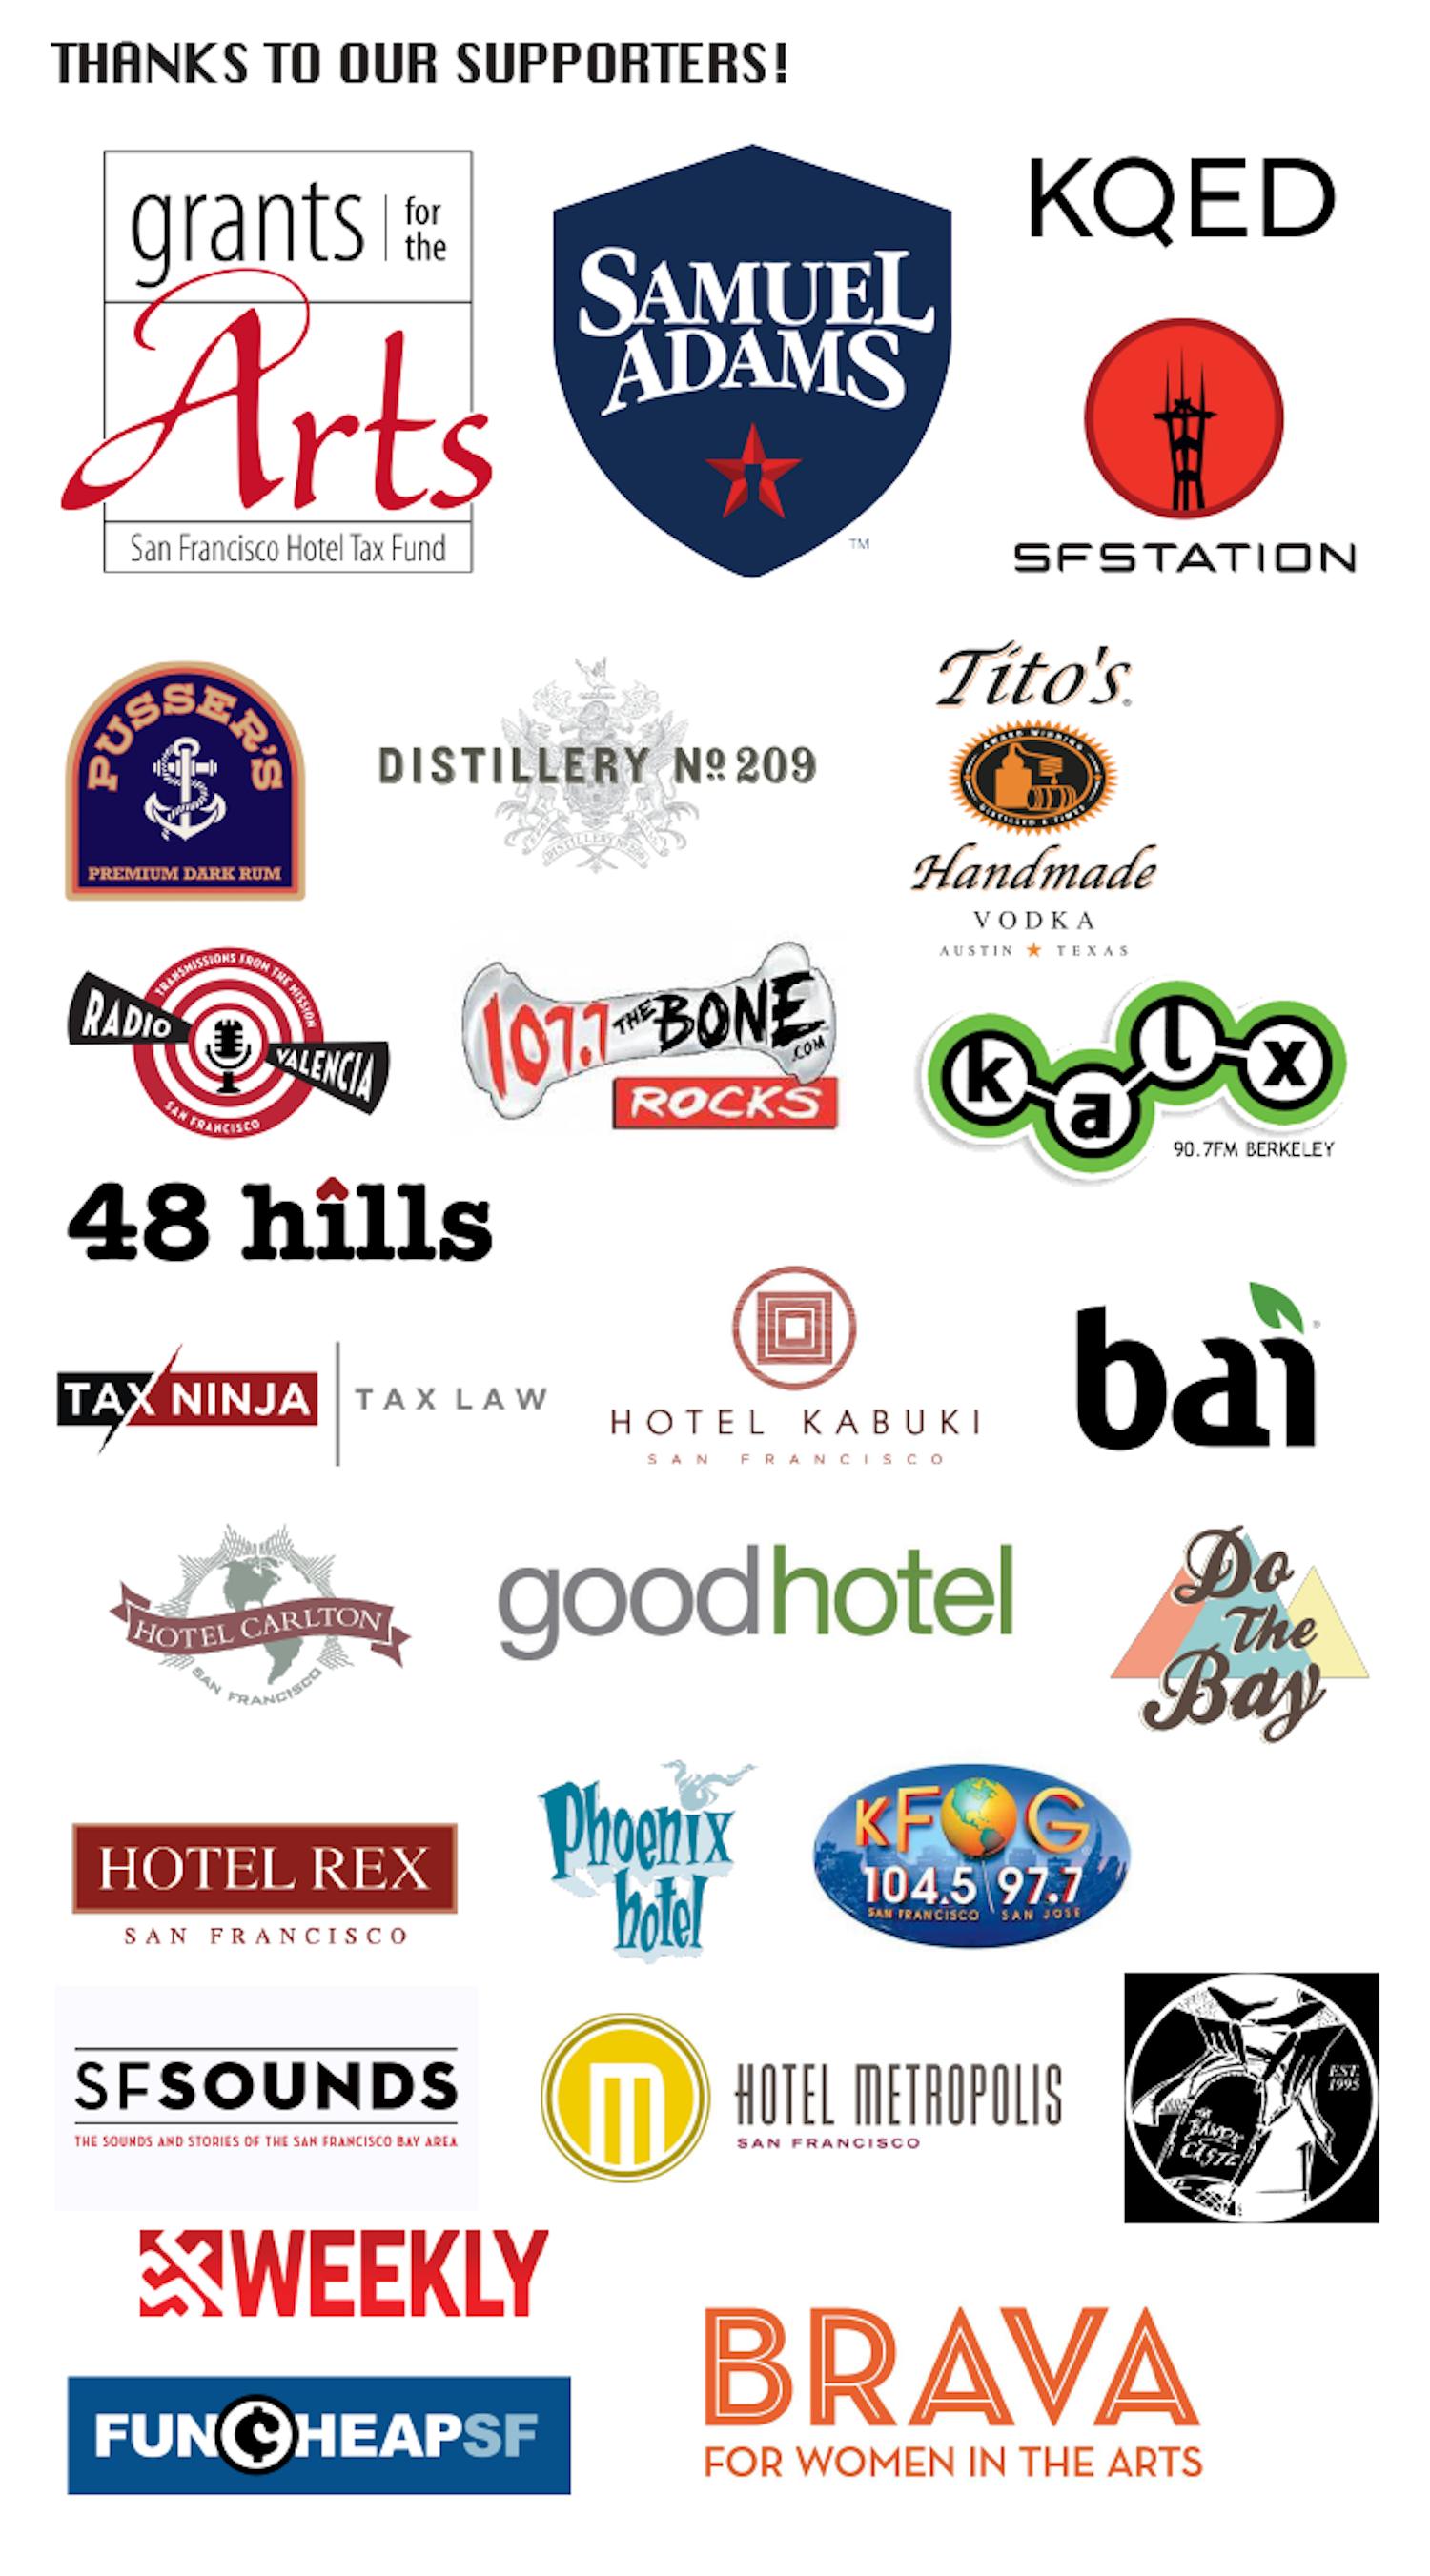 Sponsor_logos_big